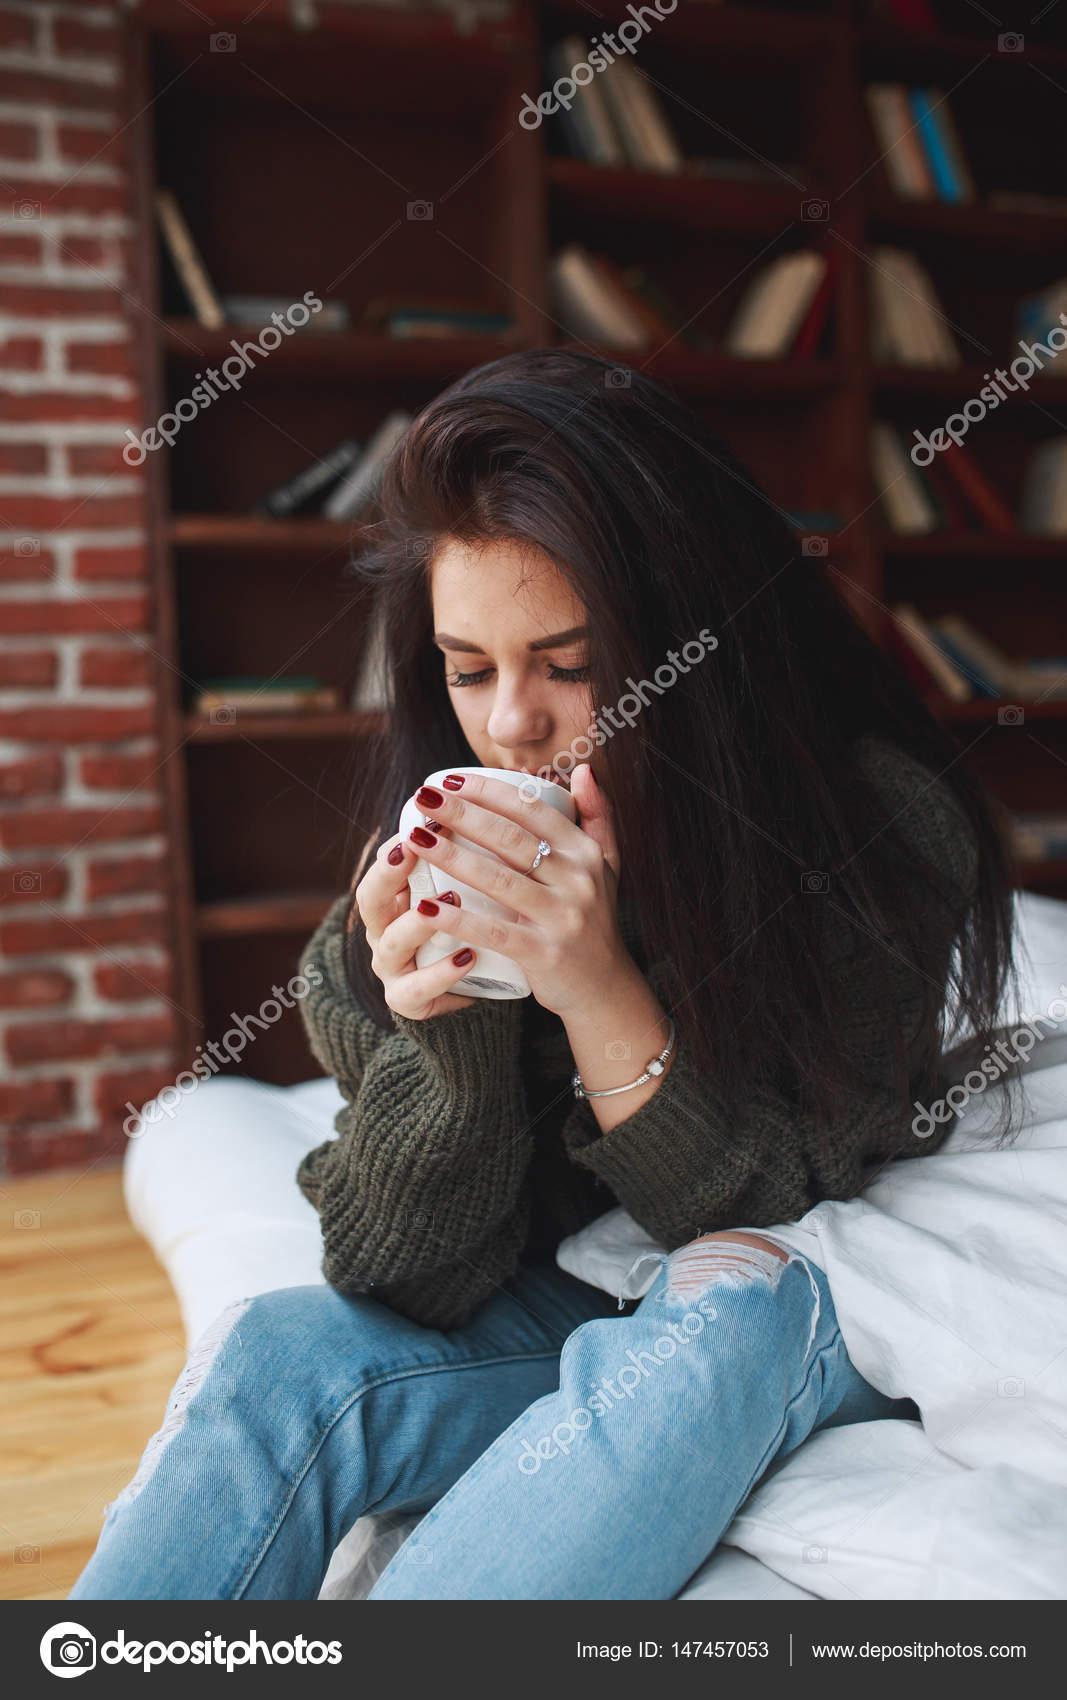 Красивая девушка брюнетка фото в домашних условиях